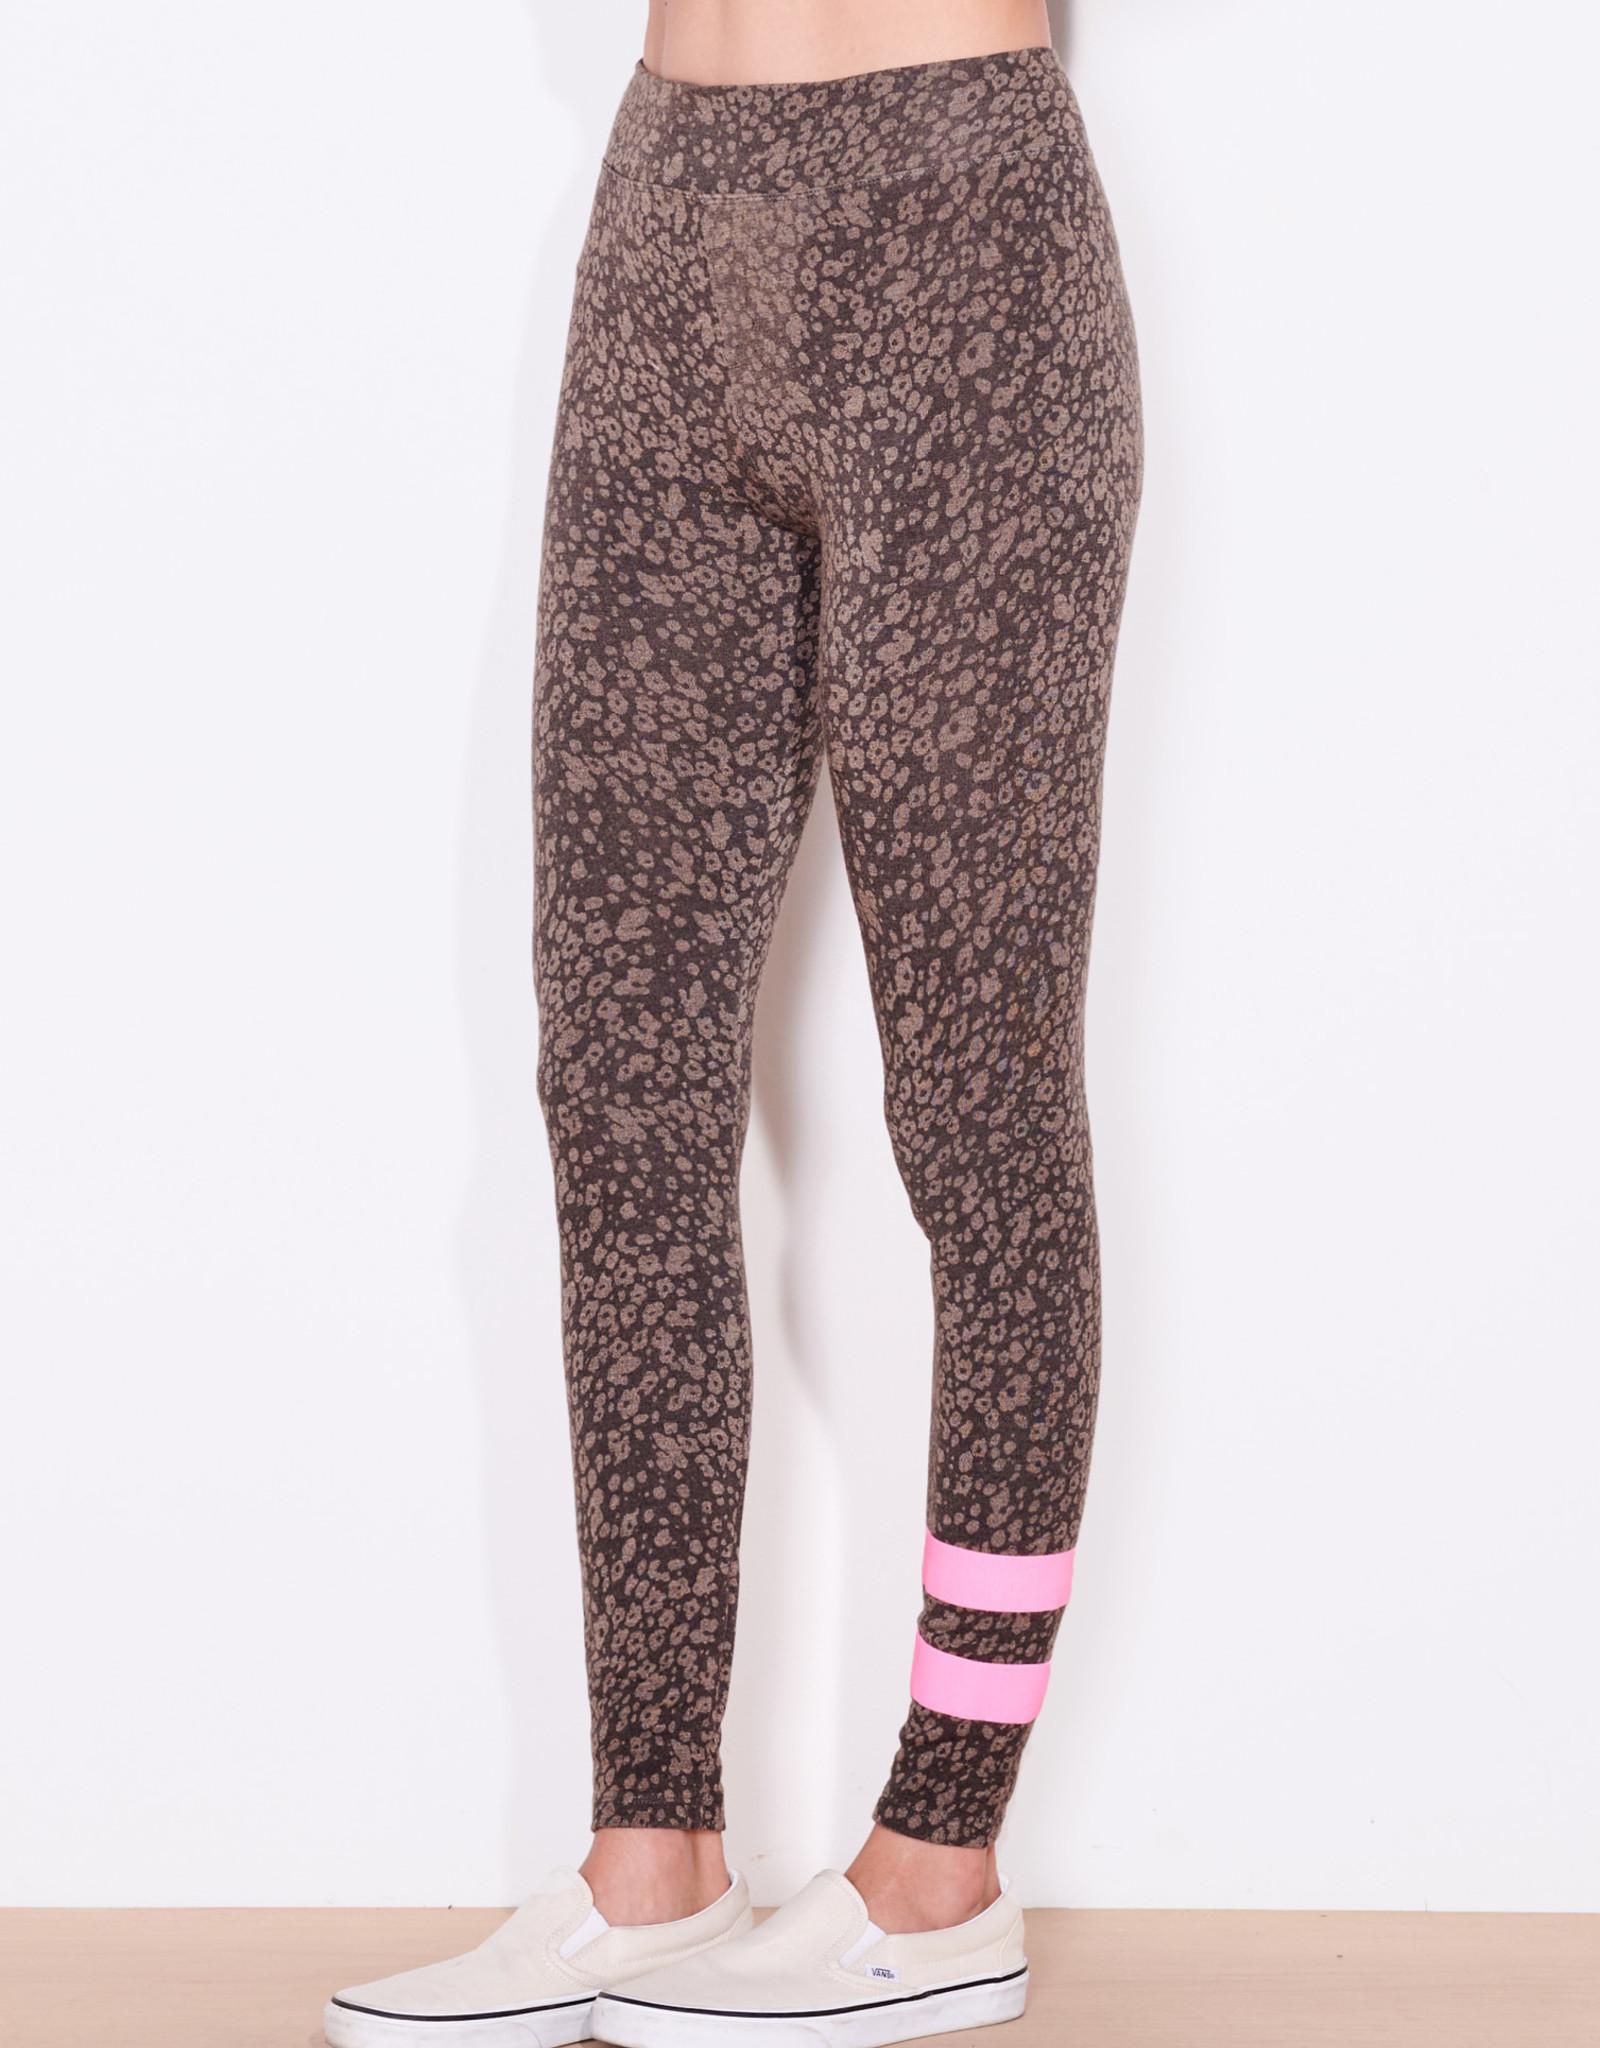 Sundry Sundry Stripe Floral Yoga Pant